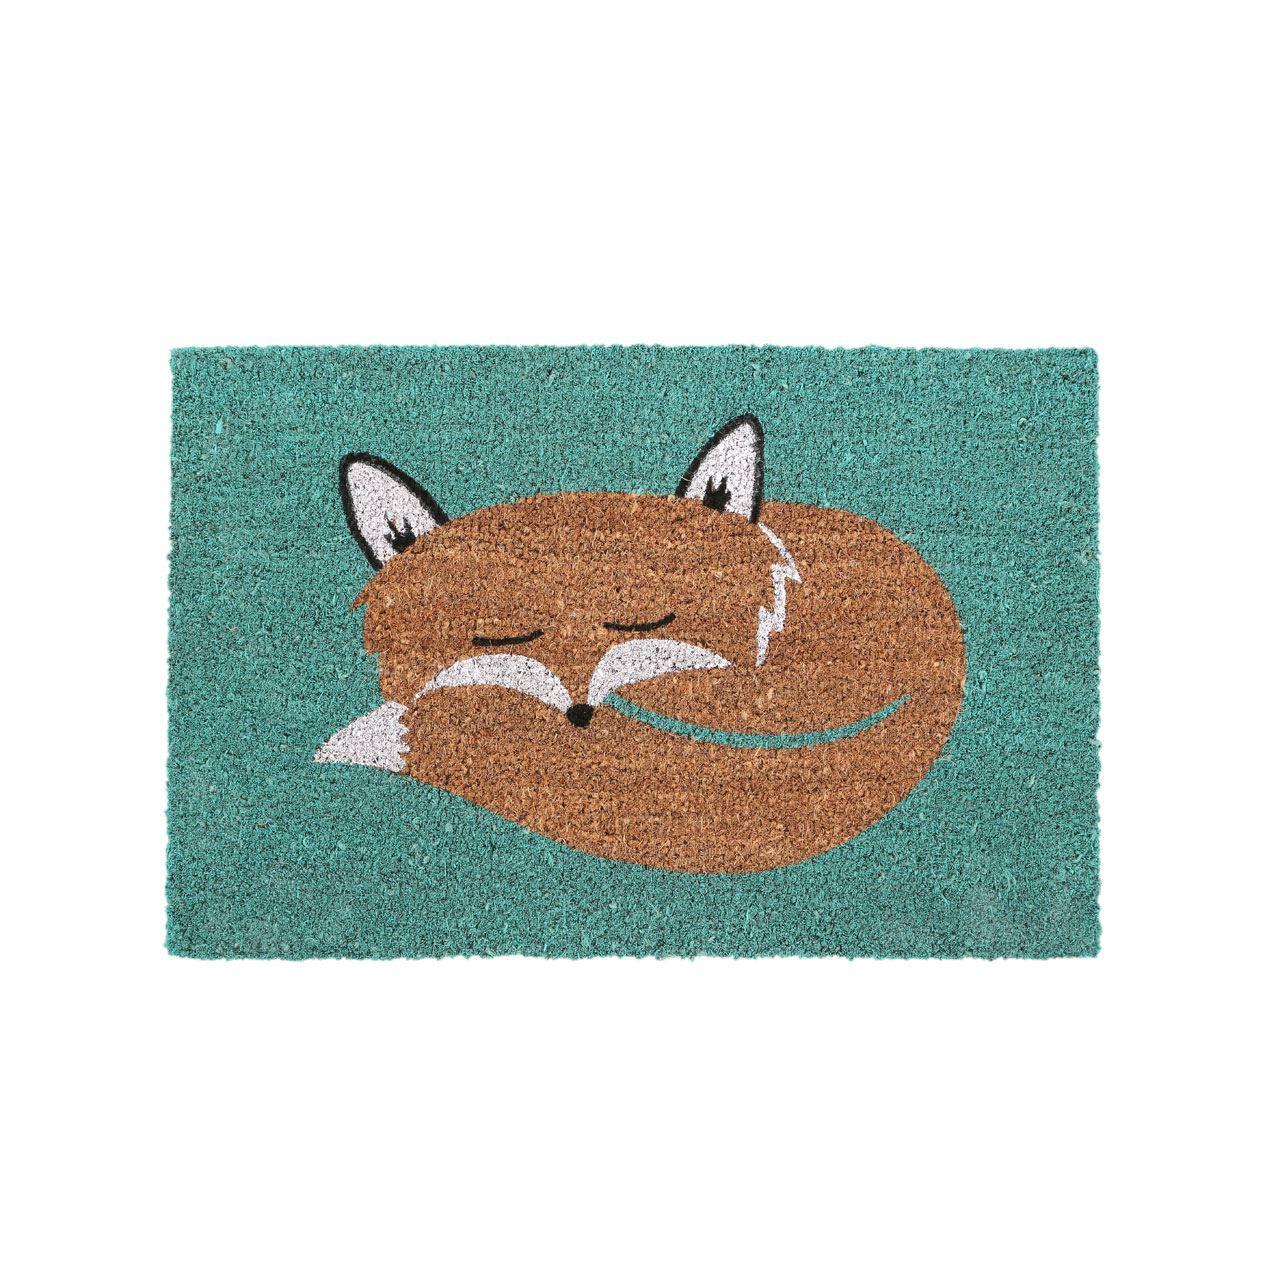 Fox Doormat,Pvc Backed Coir